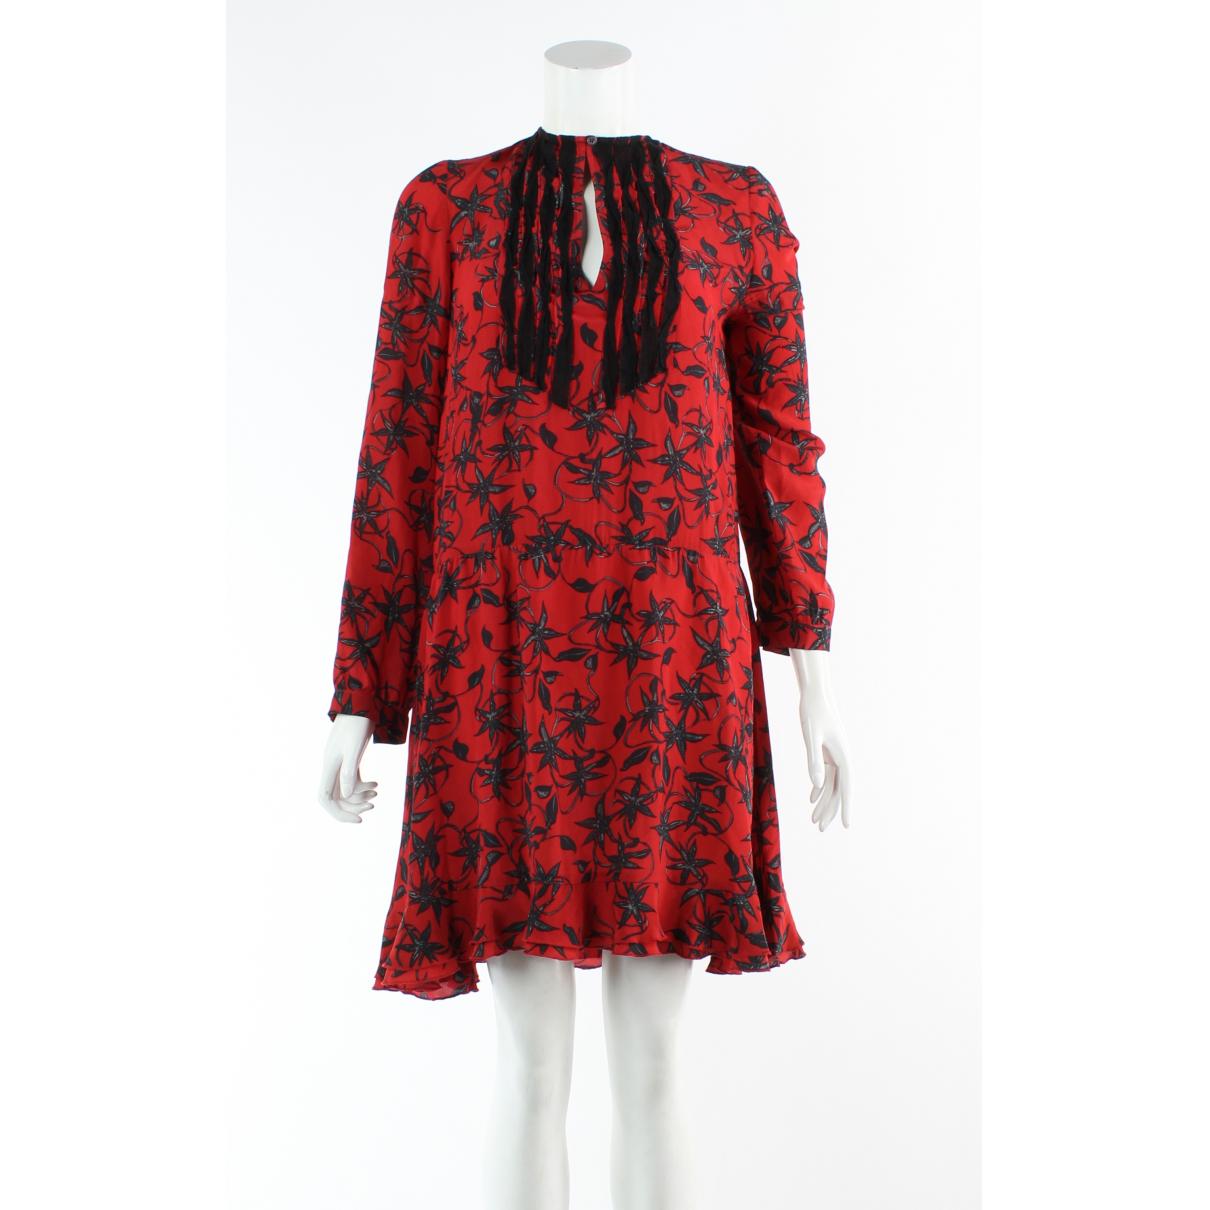 Zadig & Voltaire \N Red Silk dress for Women S International